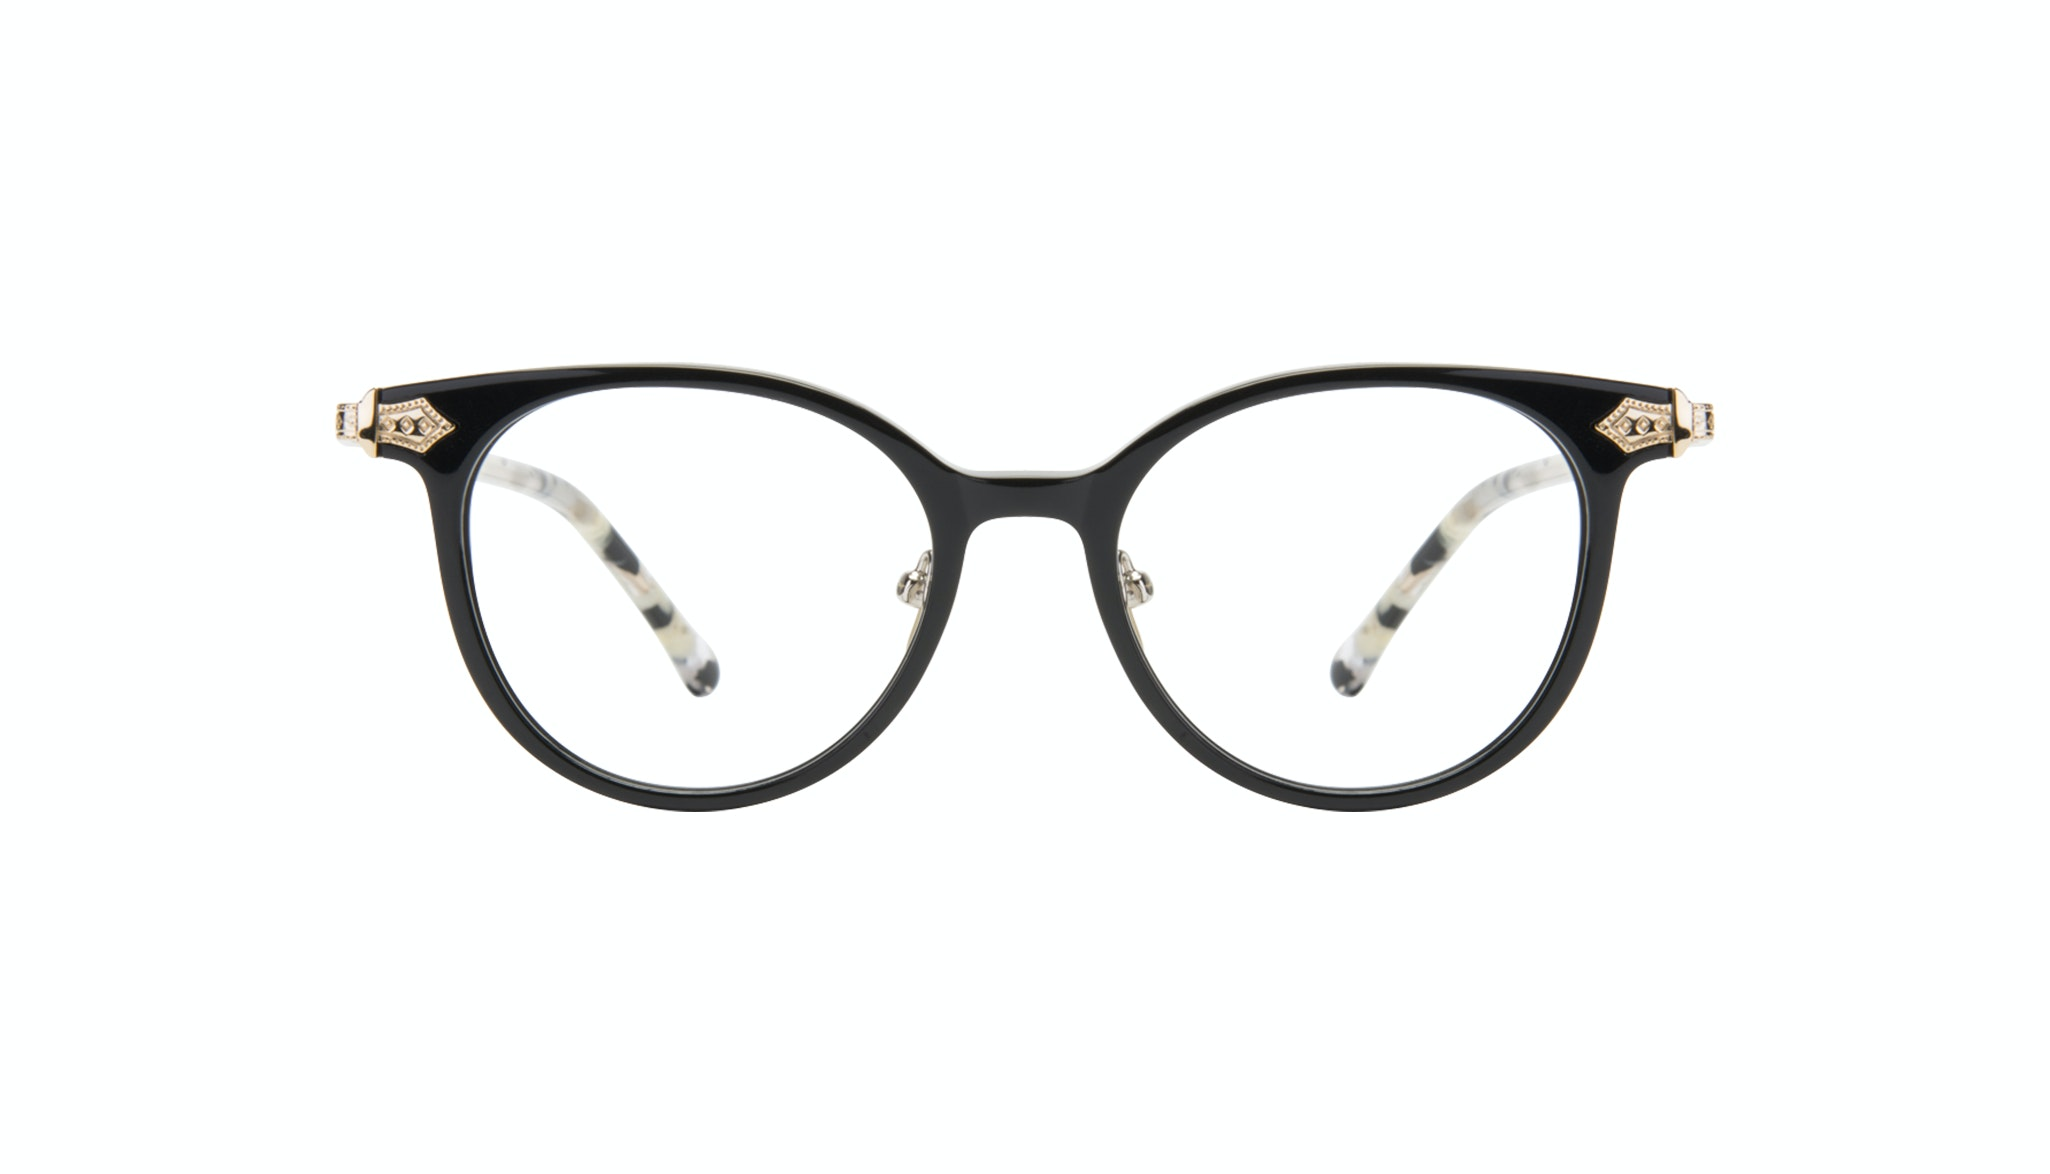 Affordable Fashion Glasses Round Eyeglasses Women Gem Onyx Marble Front